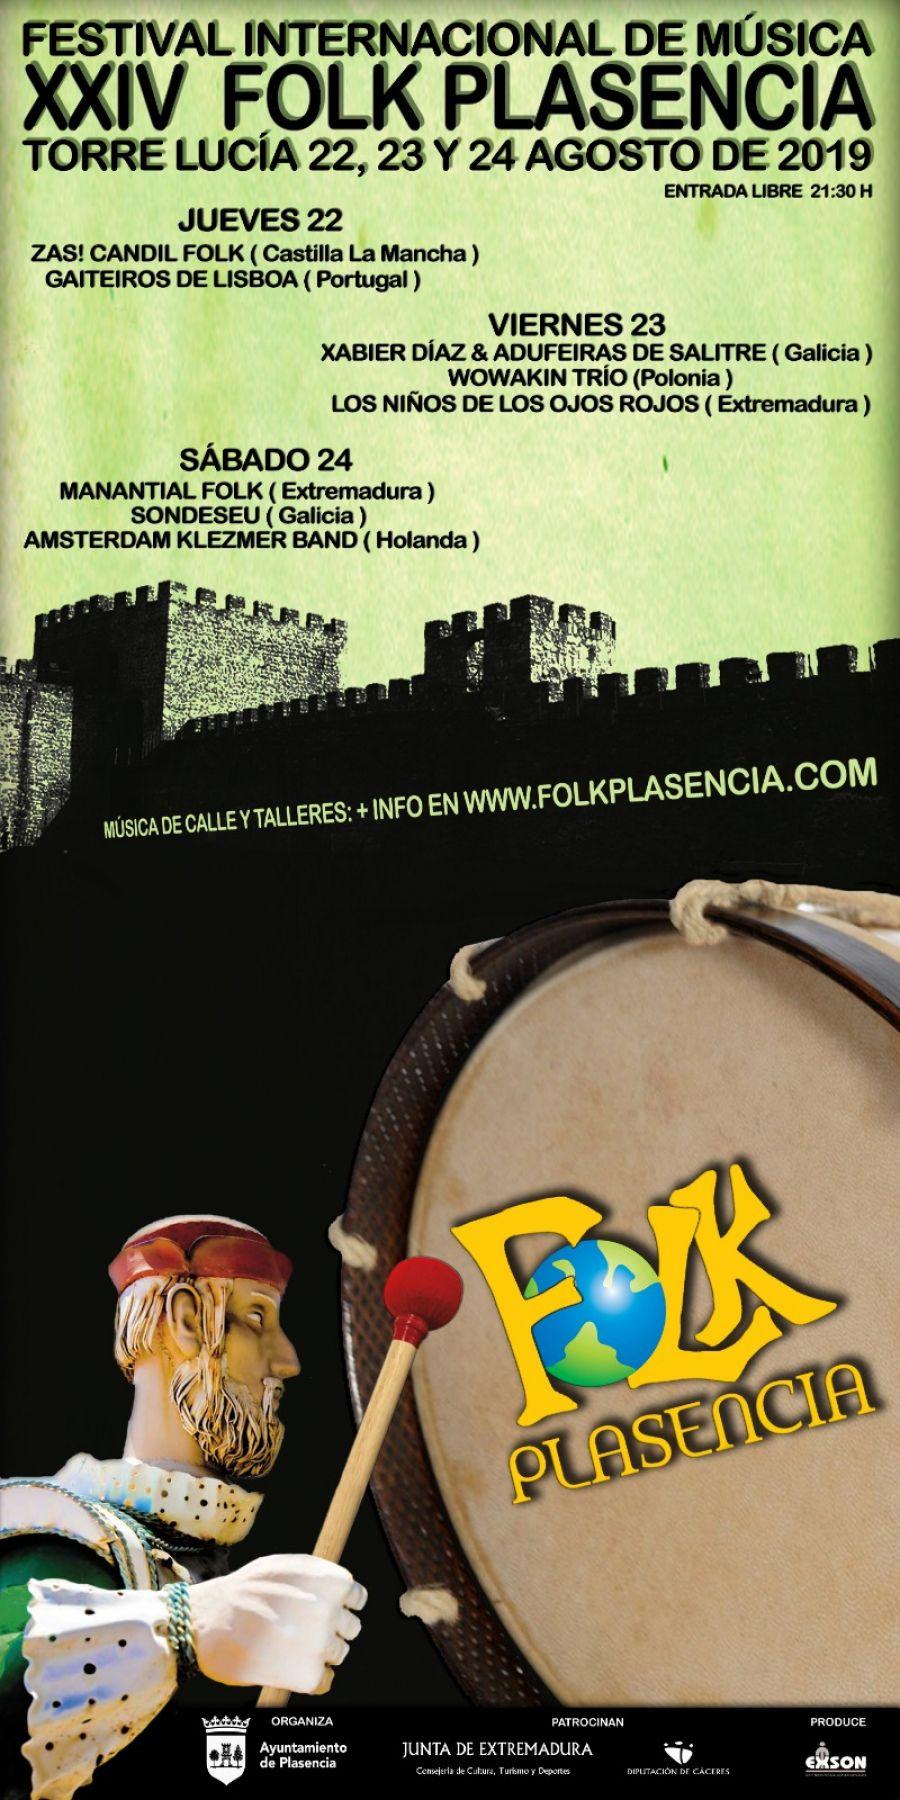 XXIV FESTIVAL FOLK PLASENCIA